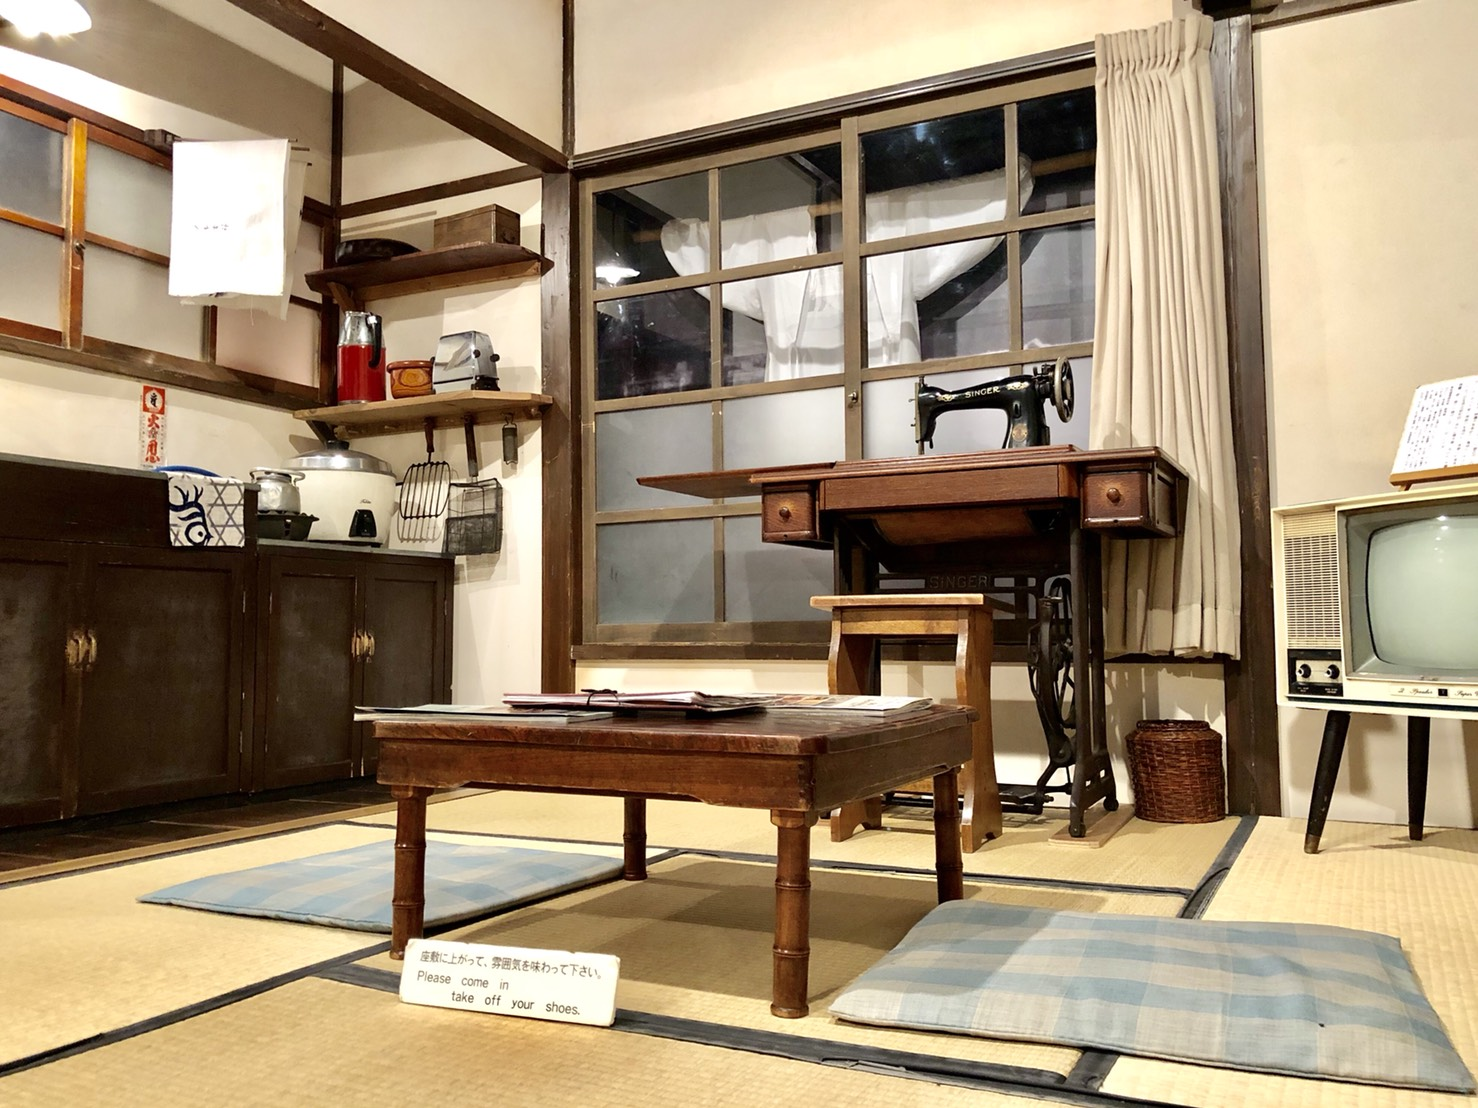 戦後・日本の居間